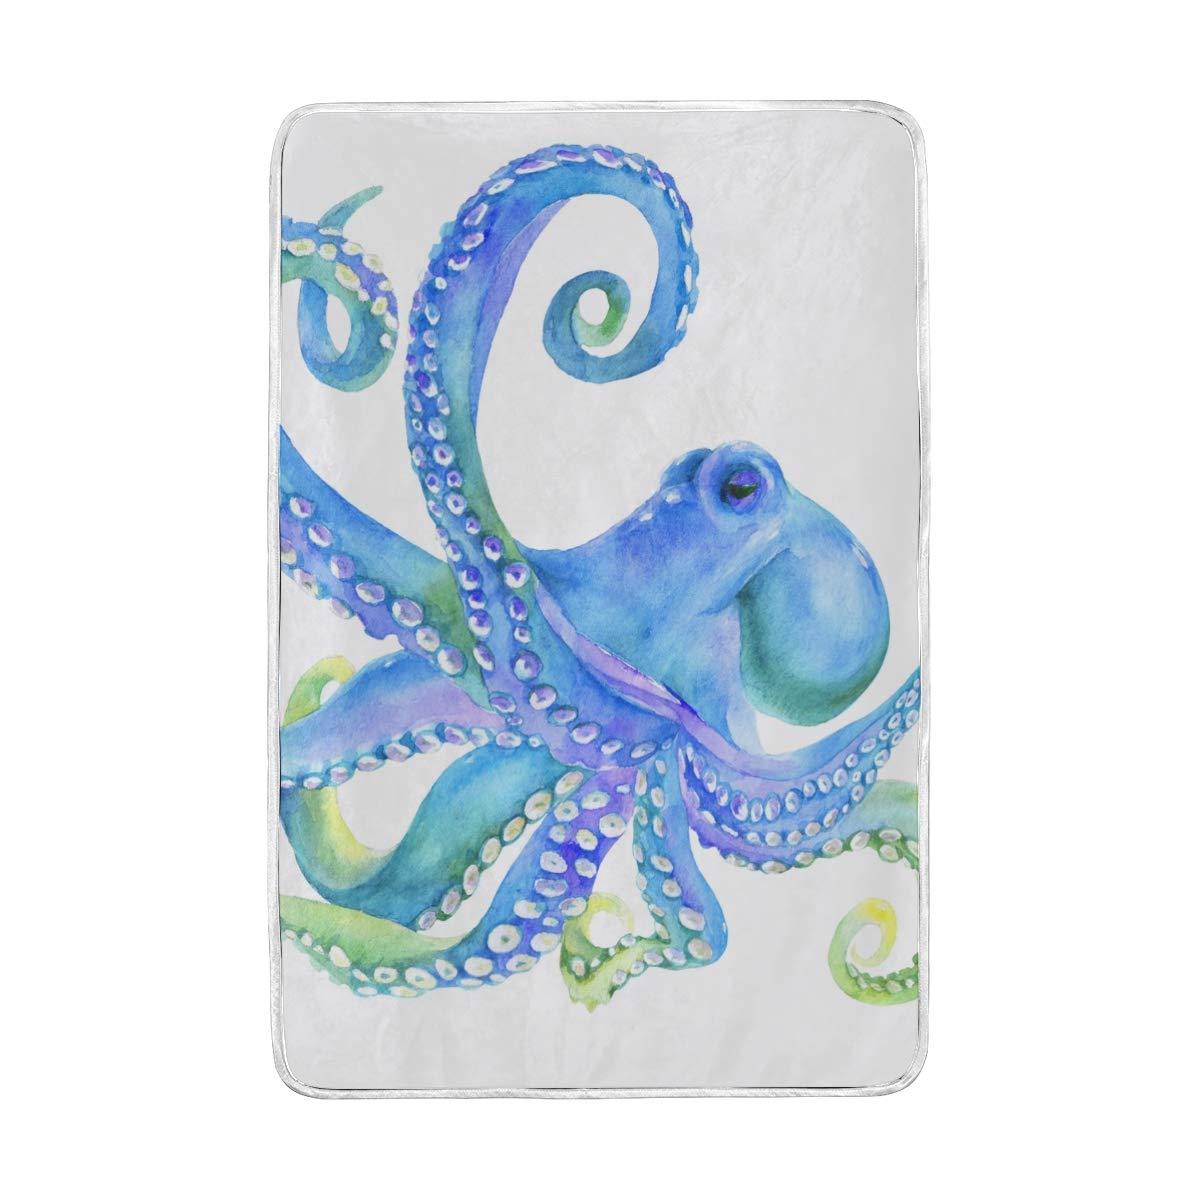 DOSHINE Zwillings-Decke, Aquarell, Ozean, Octopus, weich, leicht, wärmend, 152,4 x 228,6 cm, für Sofa, Bett, Stuhl, Büro